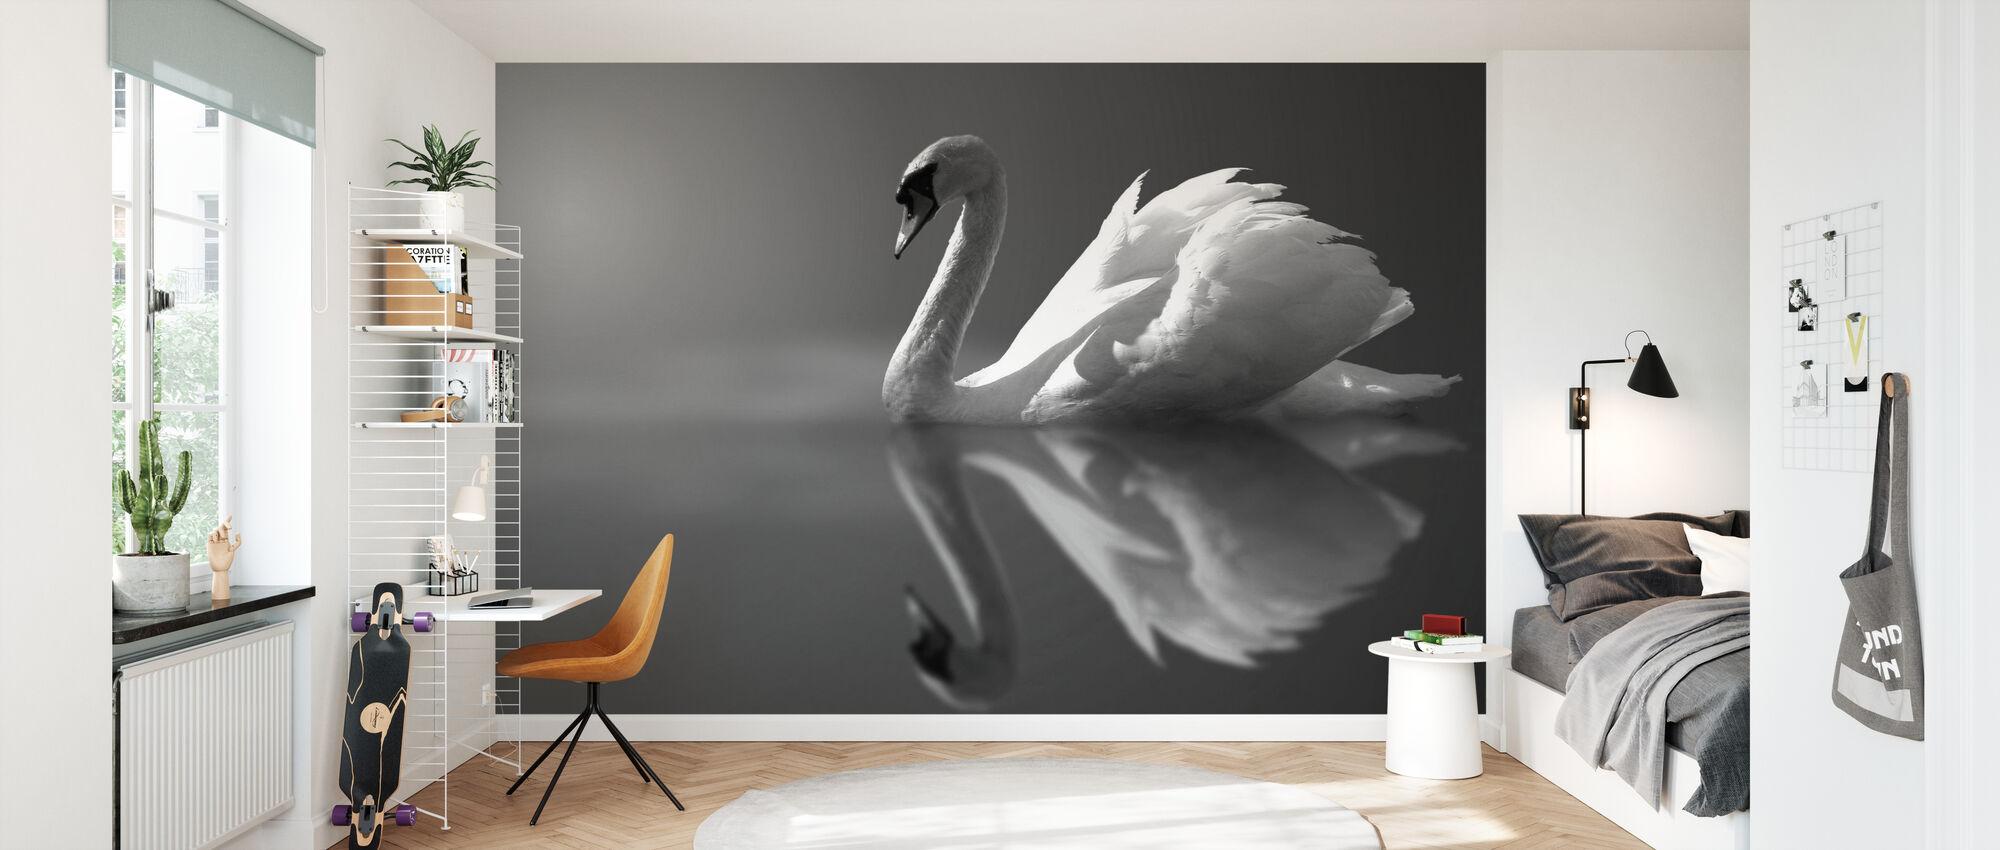 Swan Reflection - Wallpaper - Kids Room